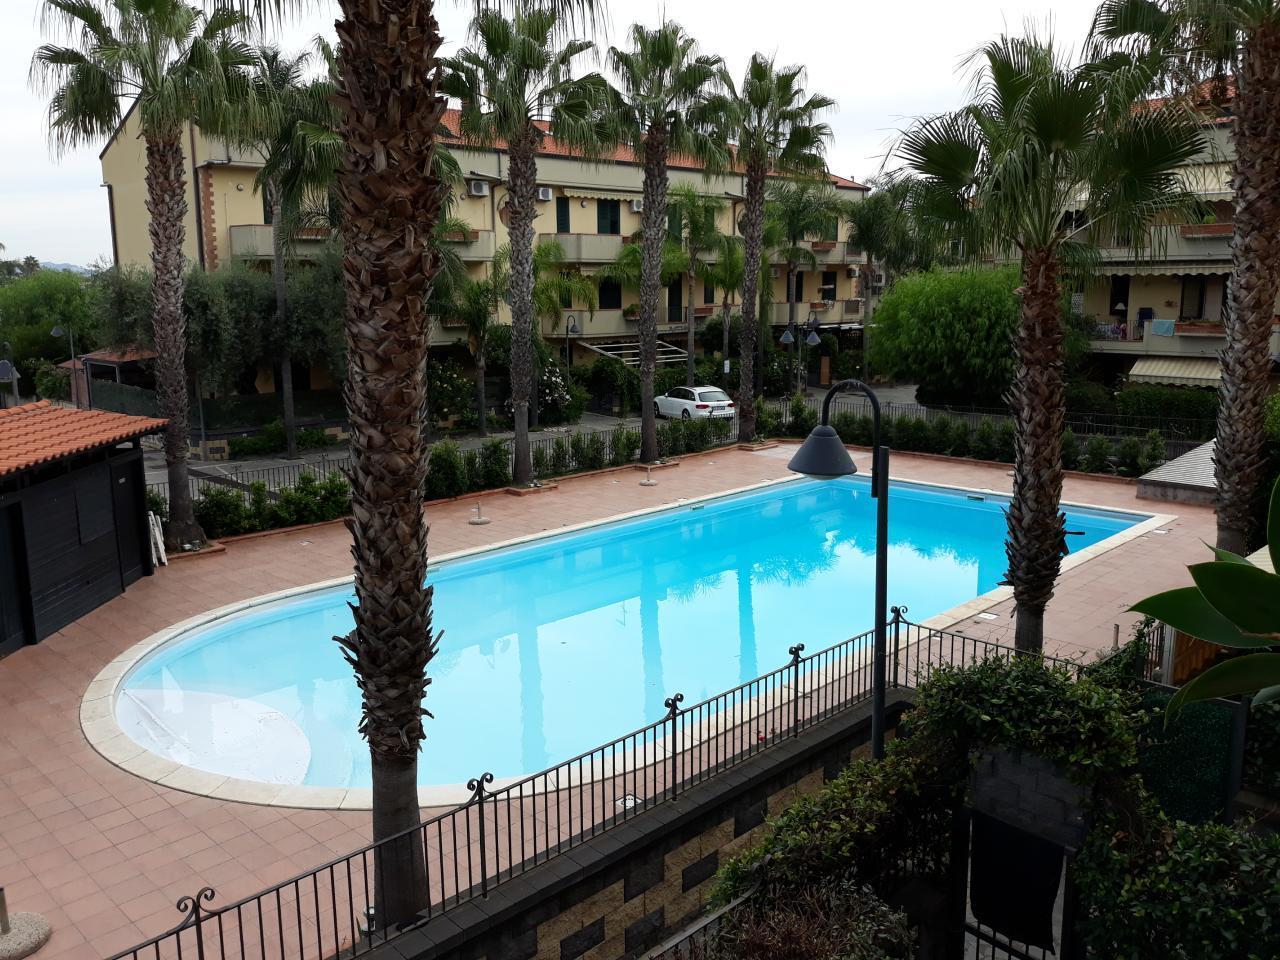 Appartement de vacances MARE - ETNA - TAORMINA (2618228), Mascali, Catania, Sicile, Italie, image 3